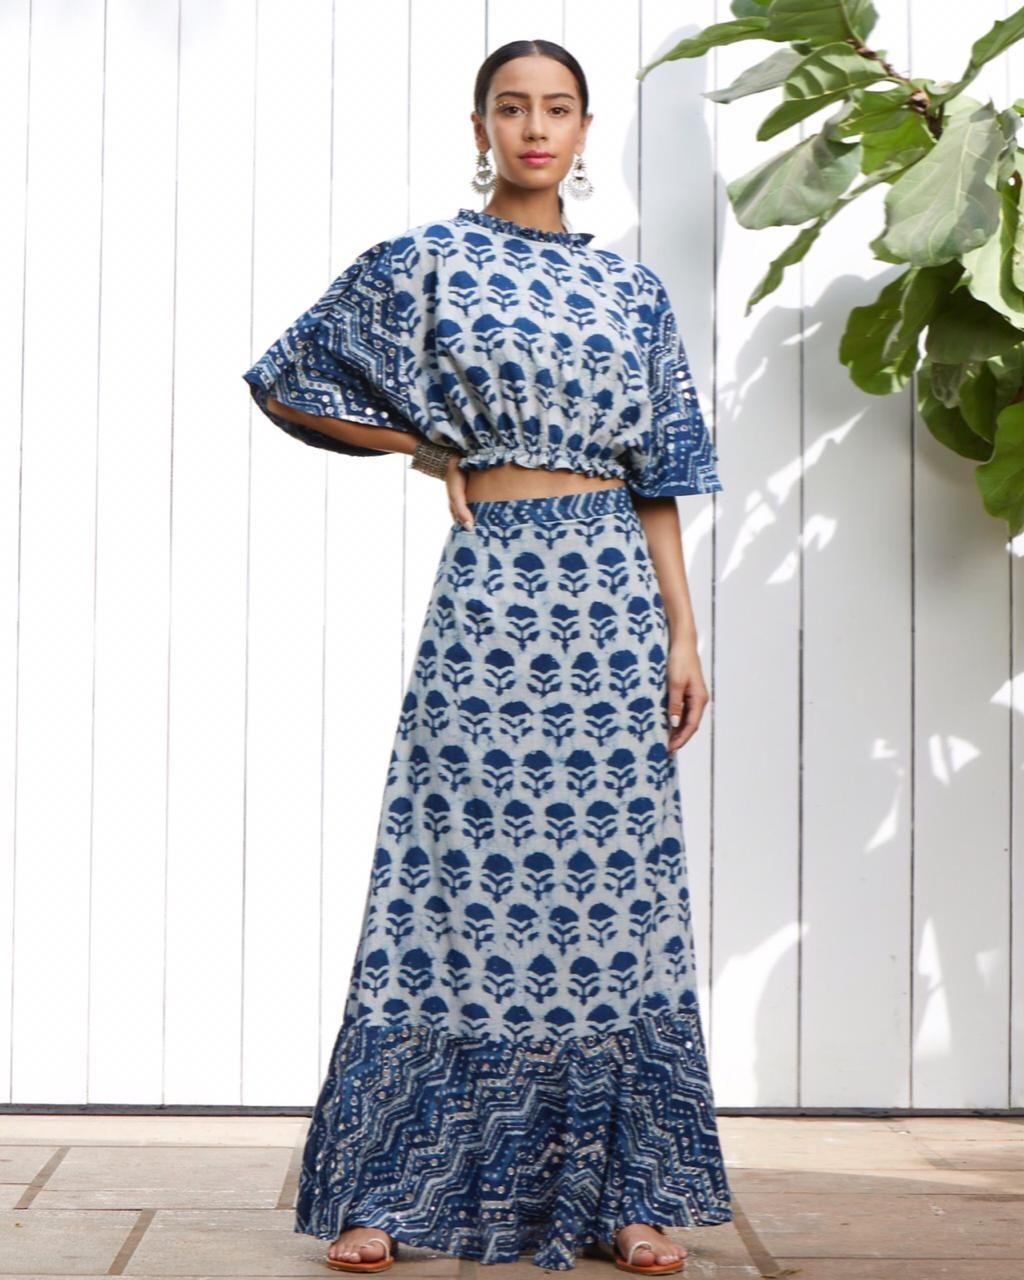 Block Printed Outfit By Akashi Perfect For Regular Wear Brunch Summer Wear Saias Curtas Saias Da Moda Vestidos De Algodao [ 1280 x 1024 Pixel ]